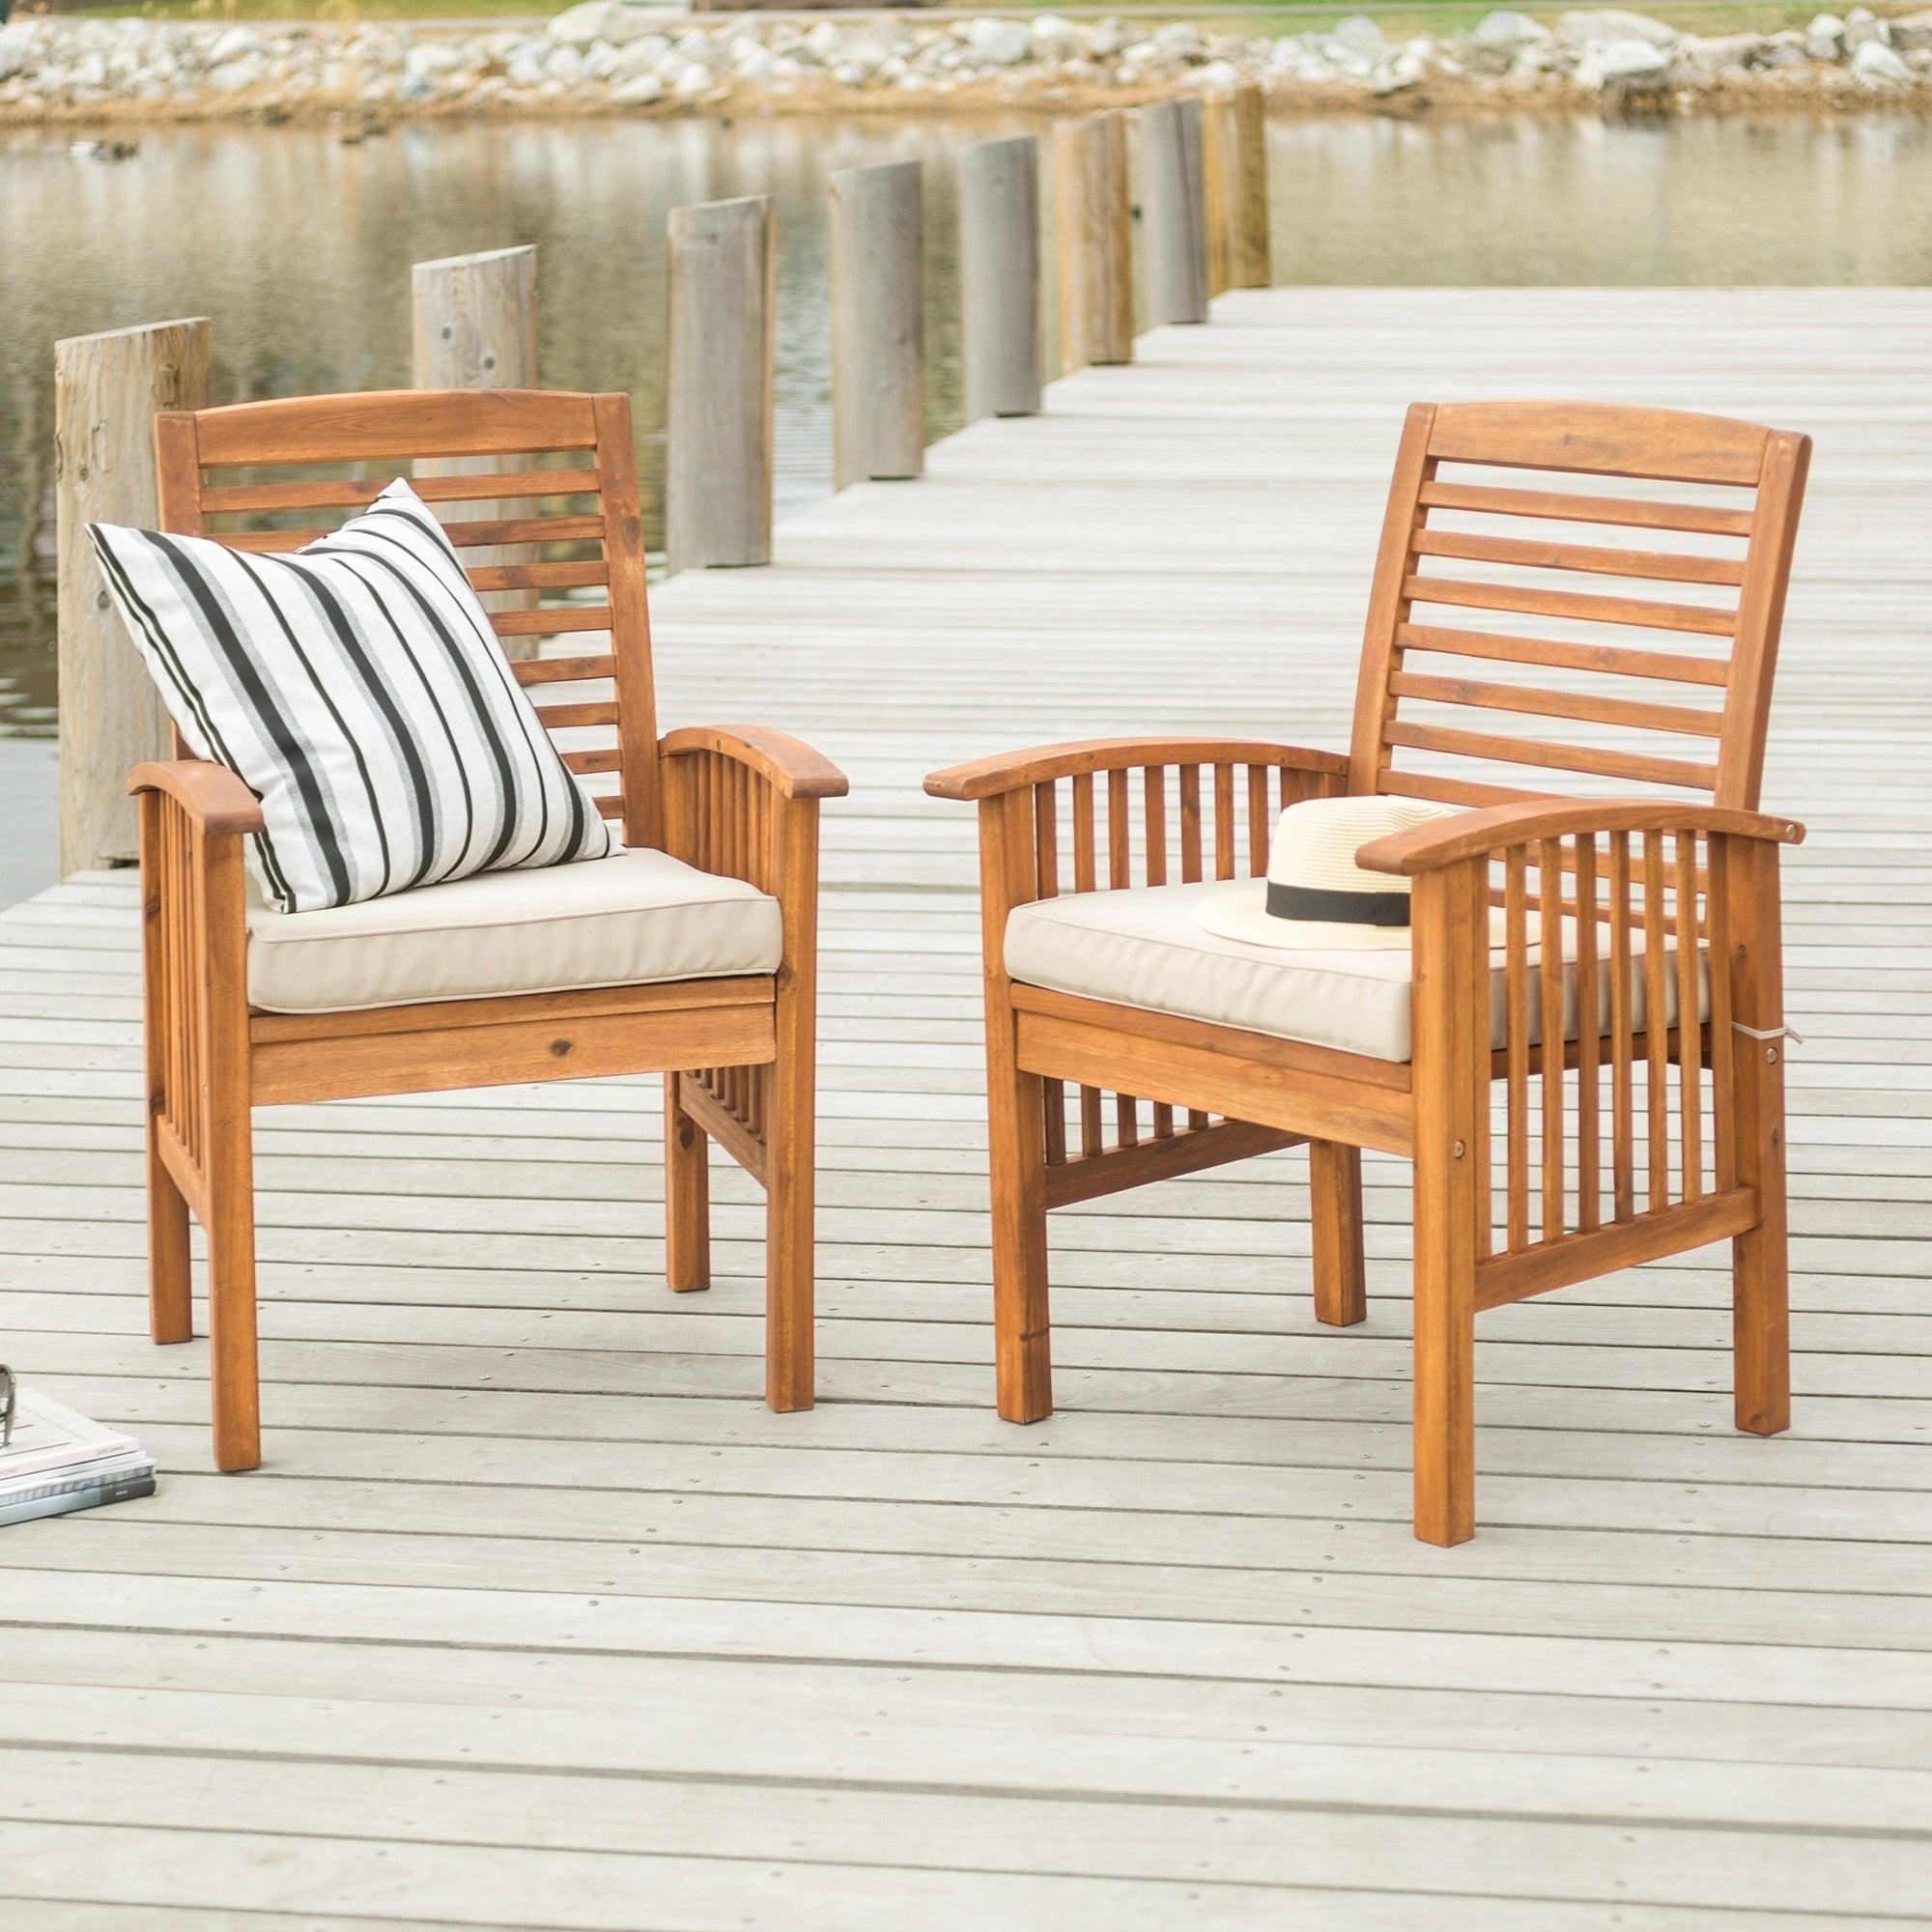 Surfside Acacia Wood Patio Chairs